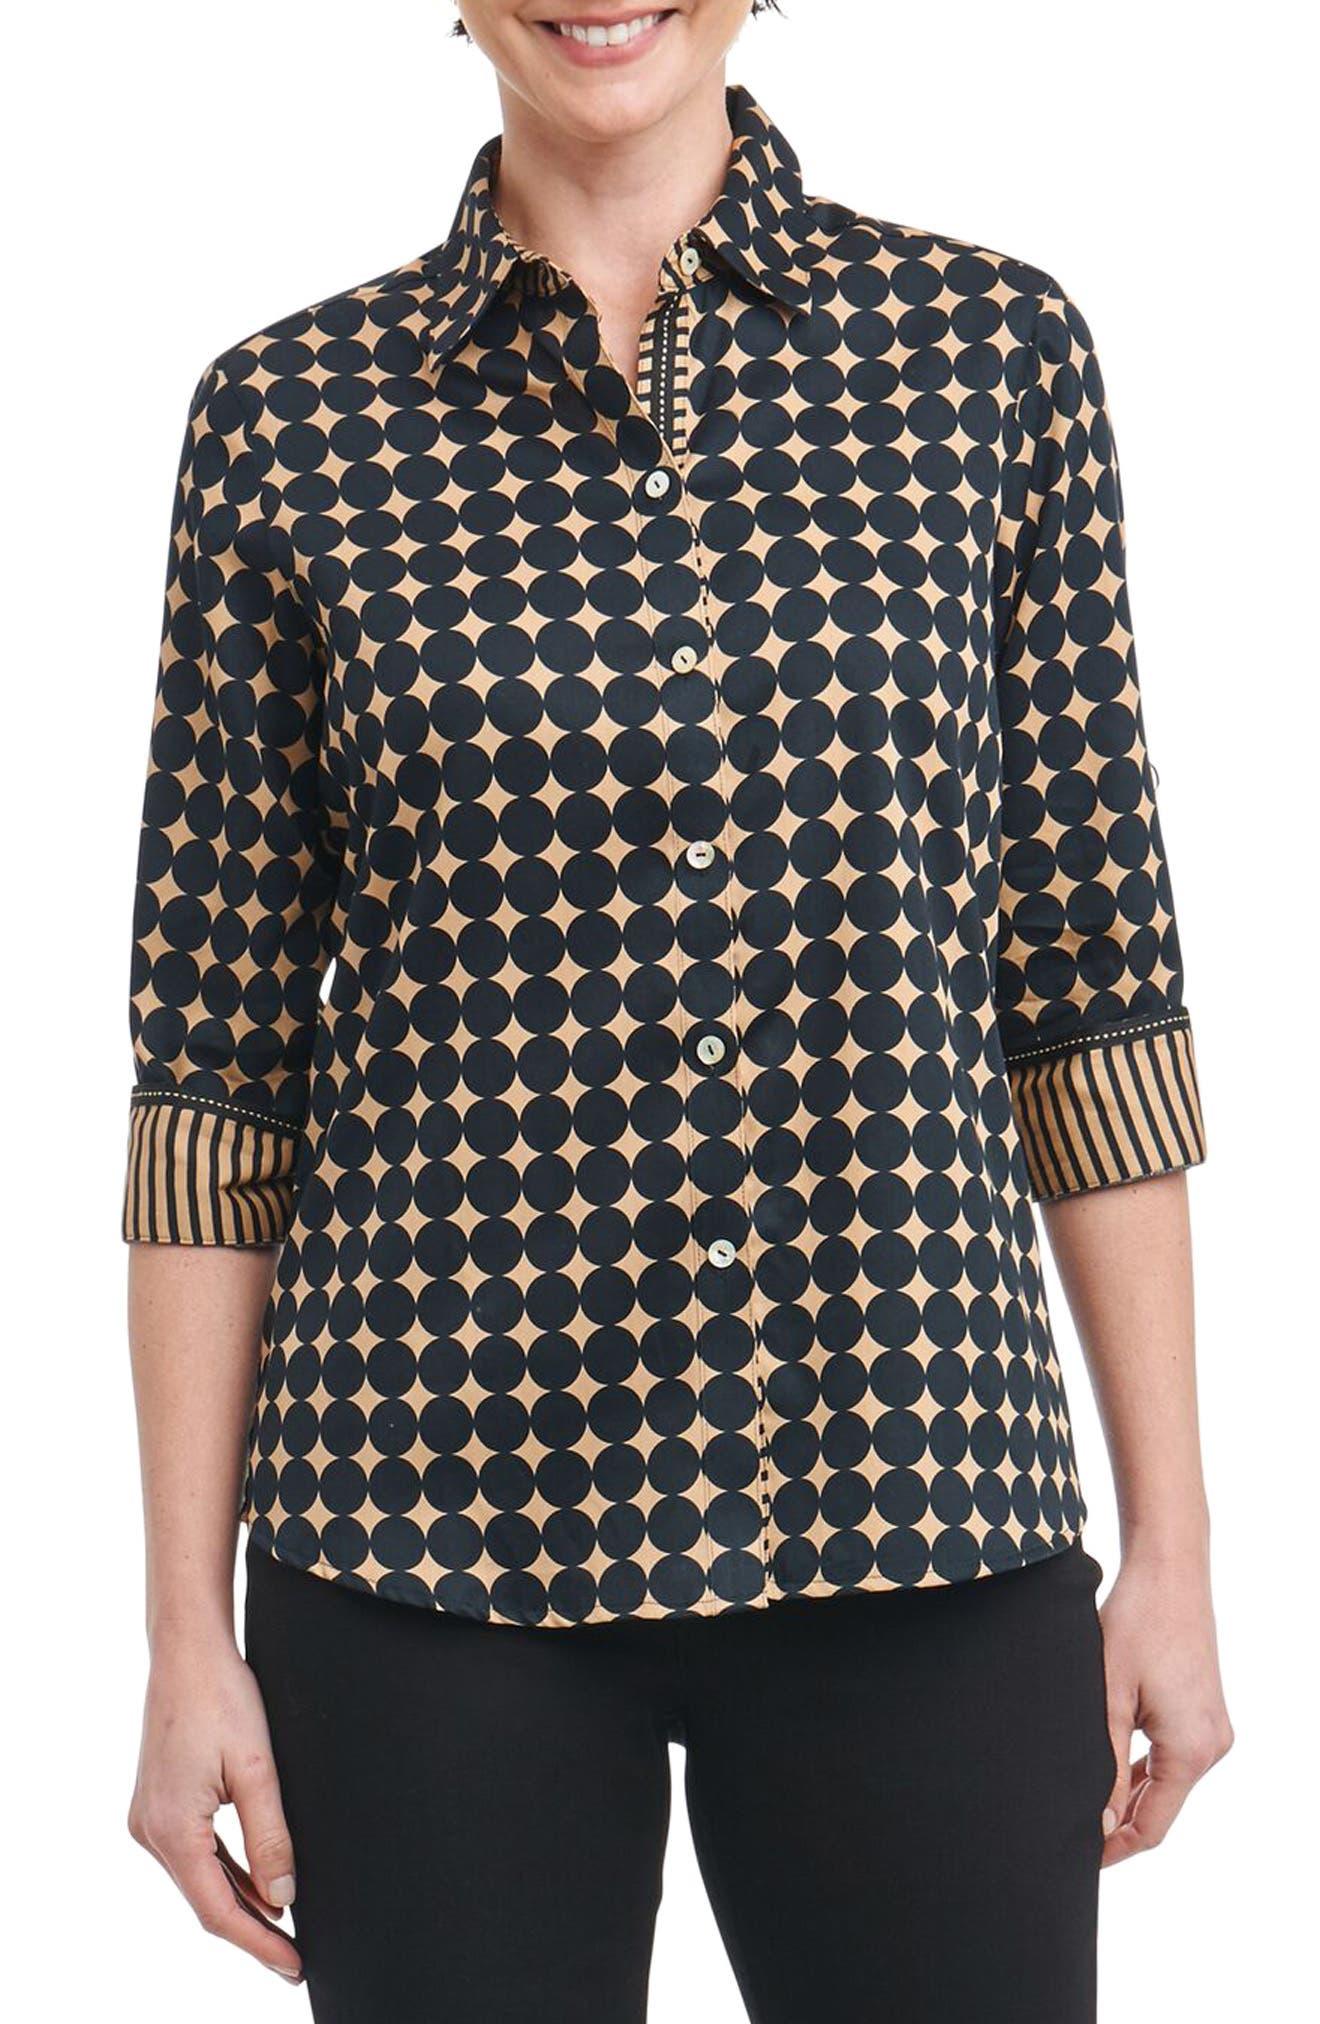 Ava Non-Iron Dot Print Cotton Shirt,                         Main,                         color, Optic Dot